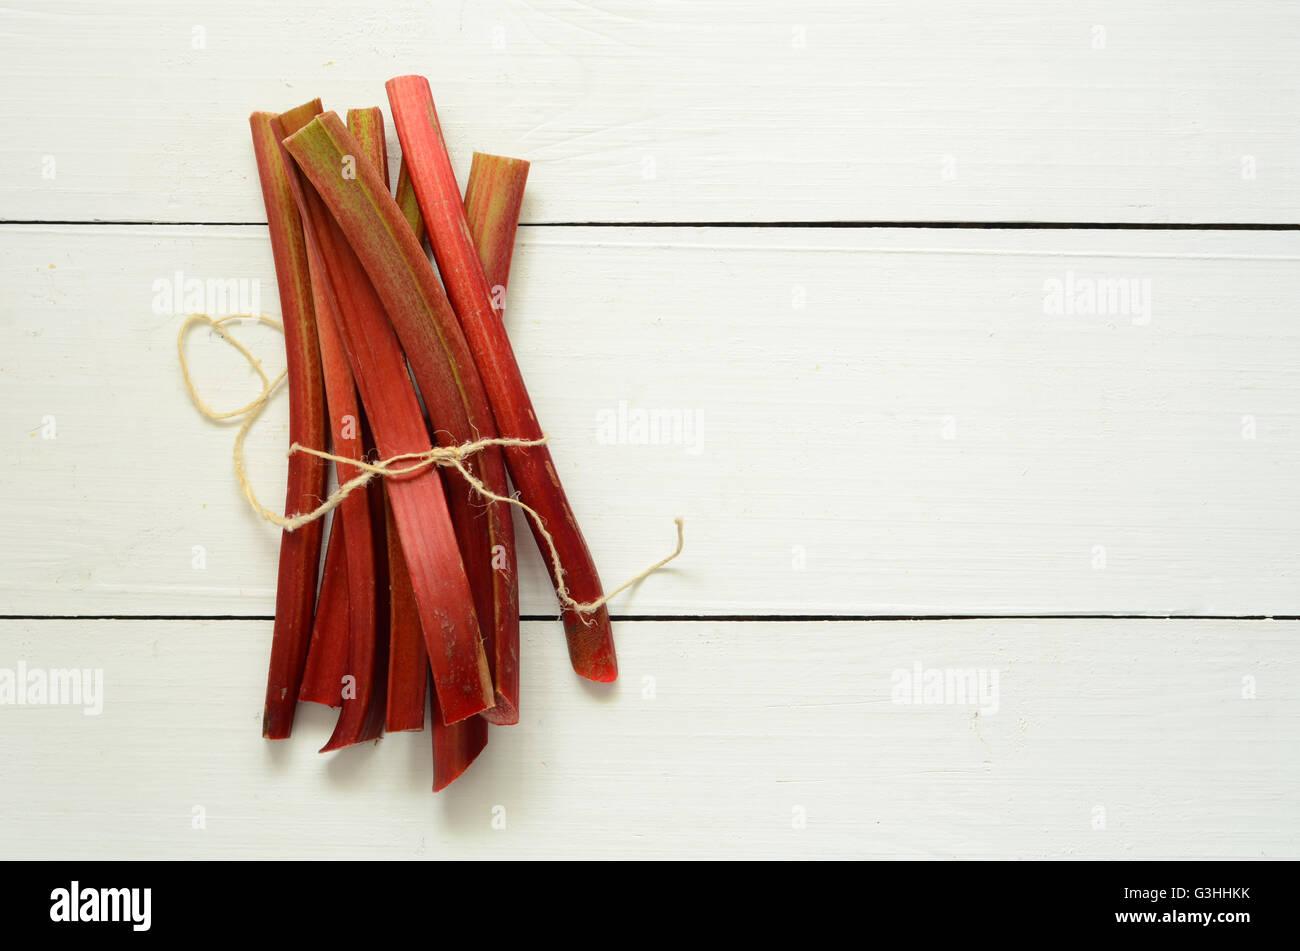 Bunch of fresh picked organic rhubarb stalks - Stock Image